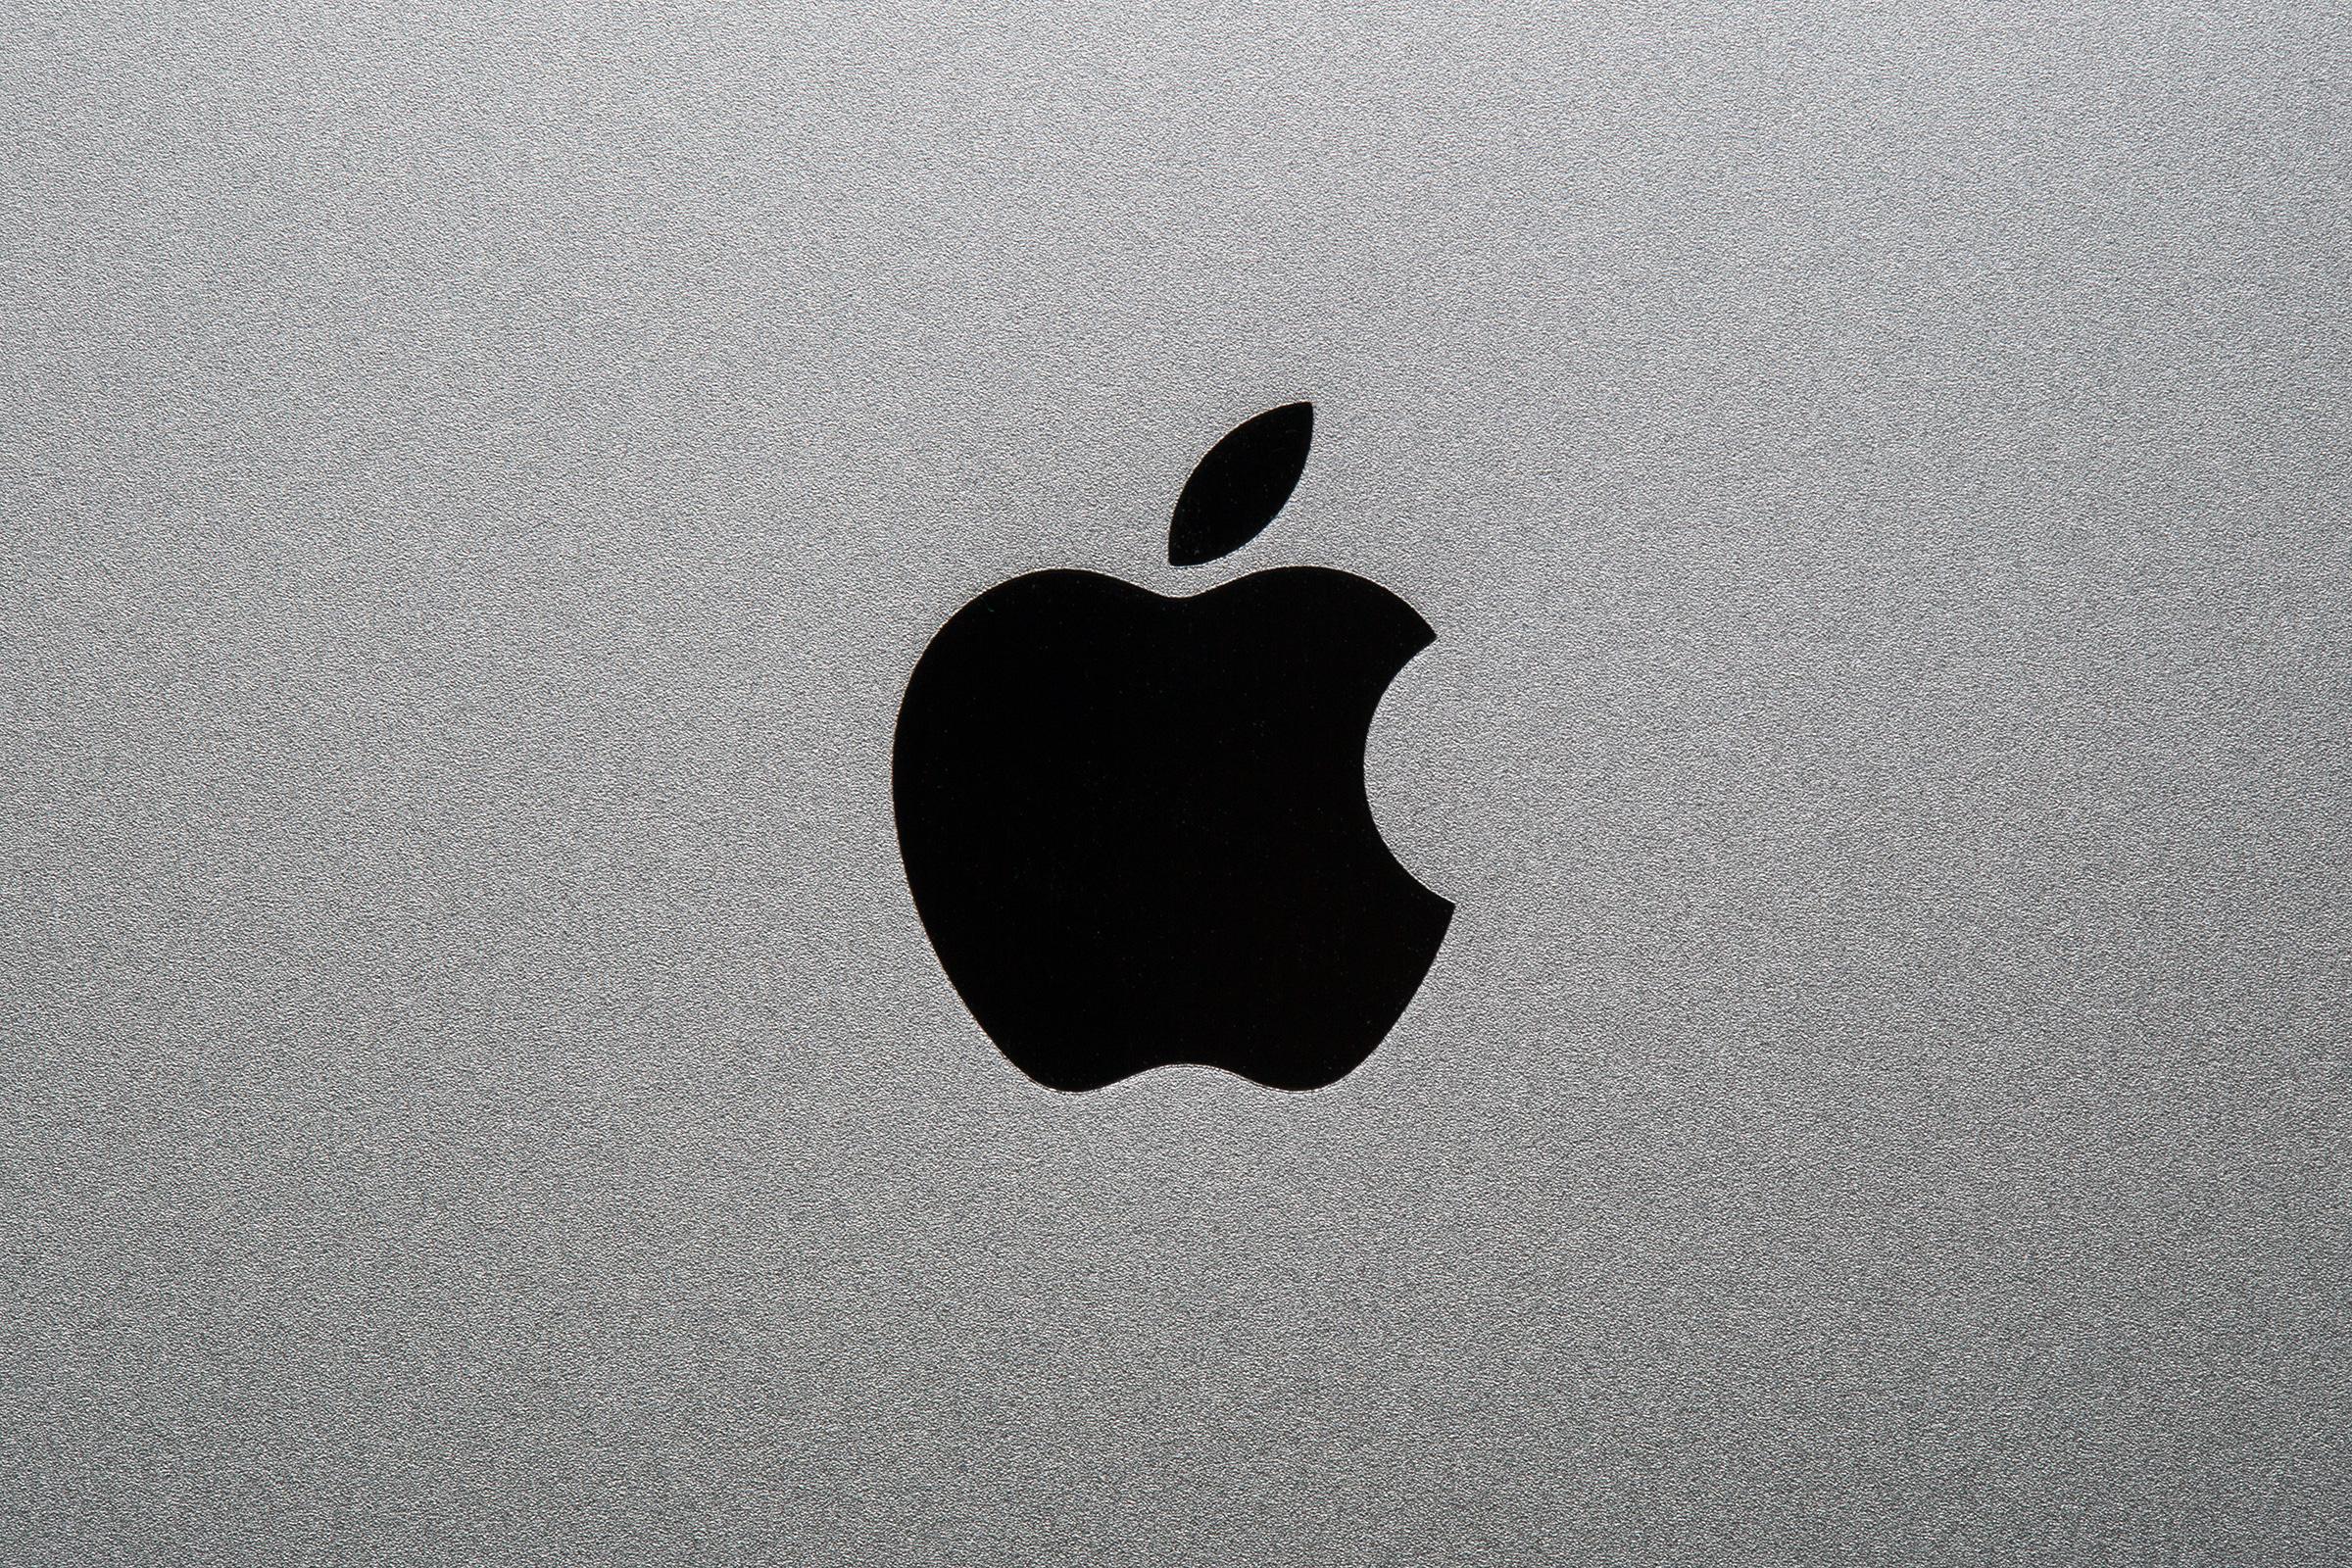 Logo da Apple preto sobre alumínio escovado